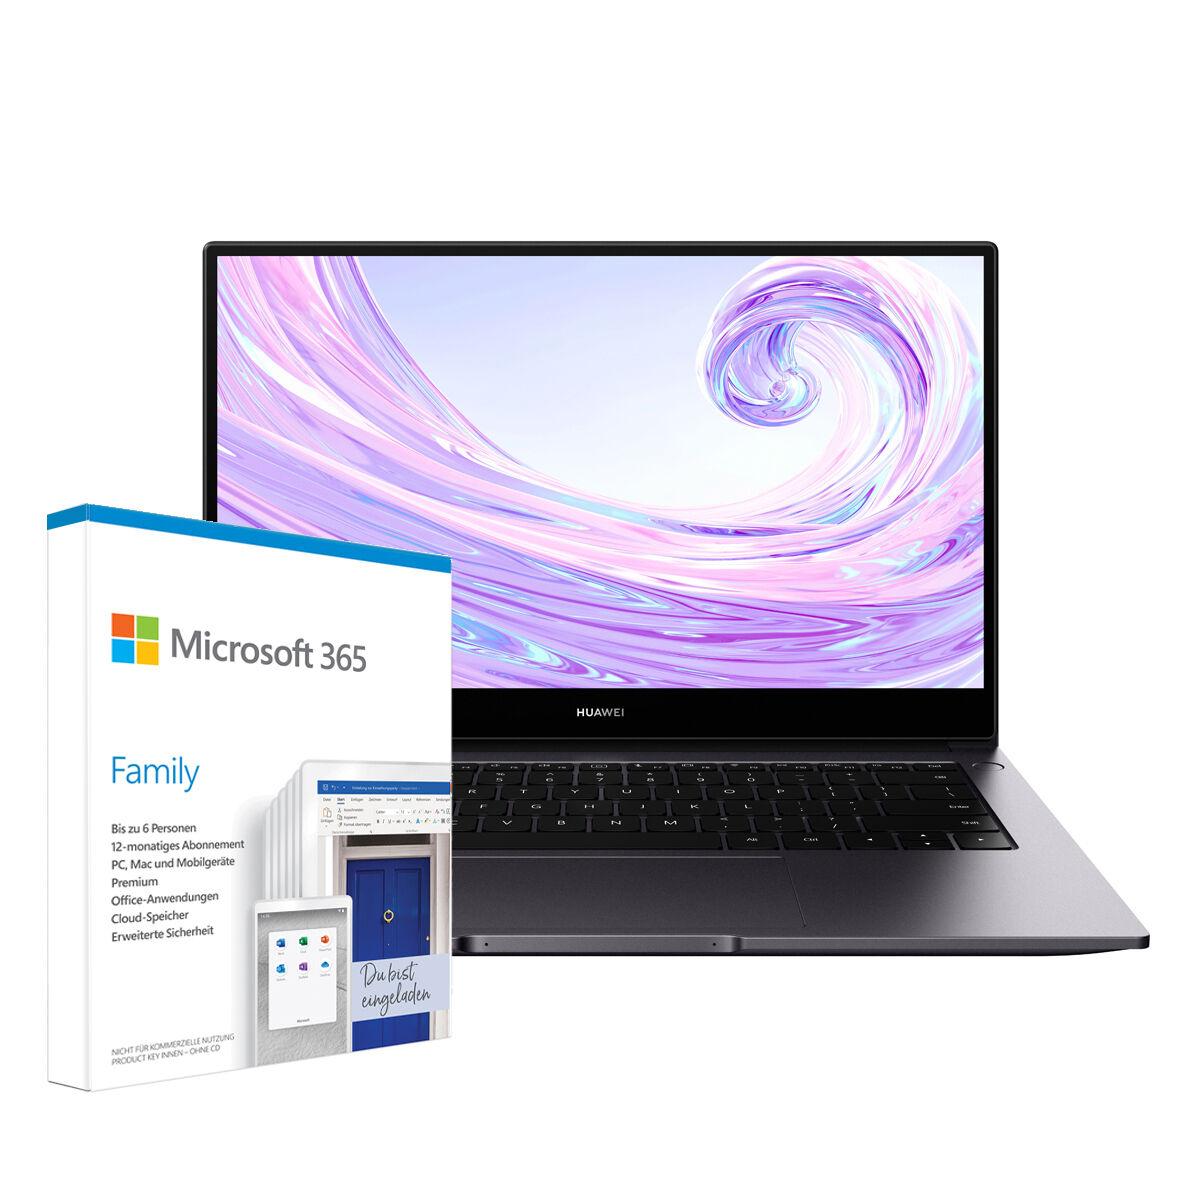 "NBB-Wochenangebote: z.B. Huawei MateBook D 14 (14"", FHD, Ryzen 5 3500U, 8GB/256GB) + Microsoft 365 Family (12 Monate, bis zu 6 Personen)"